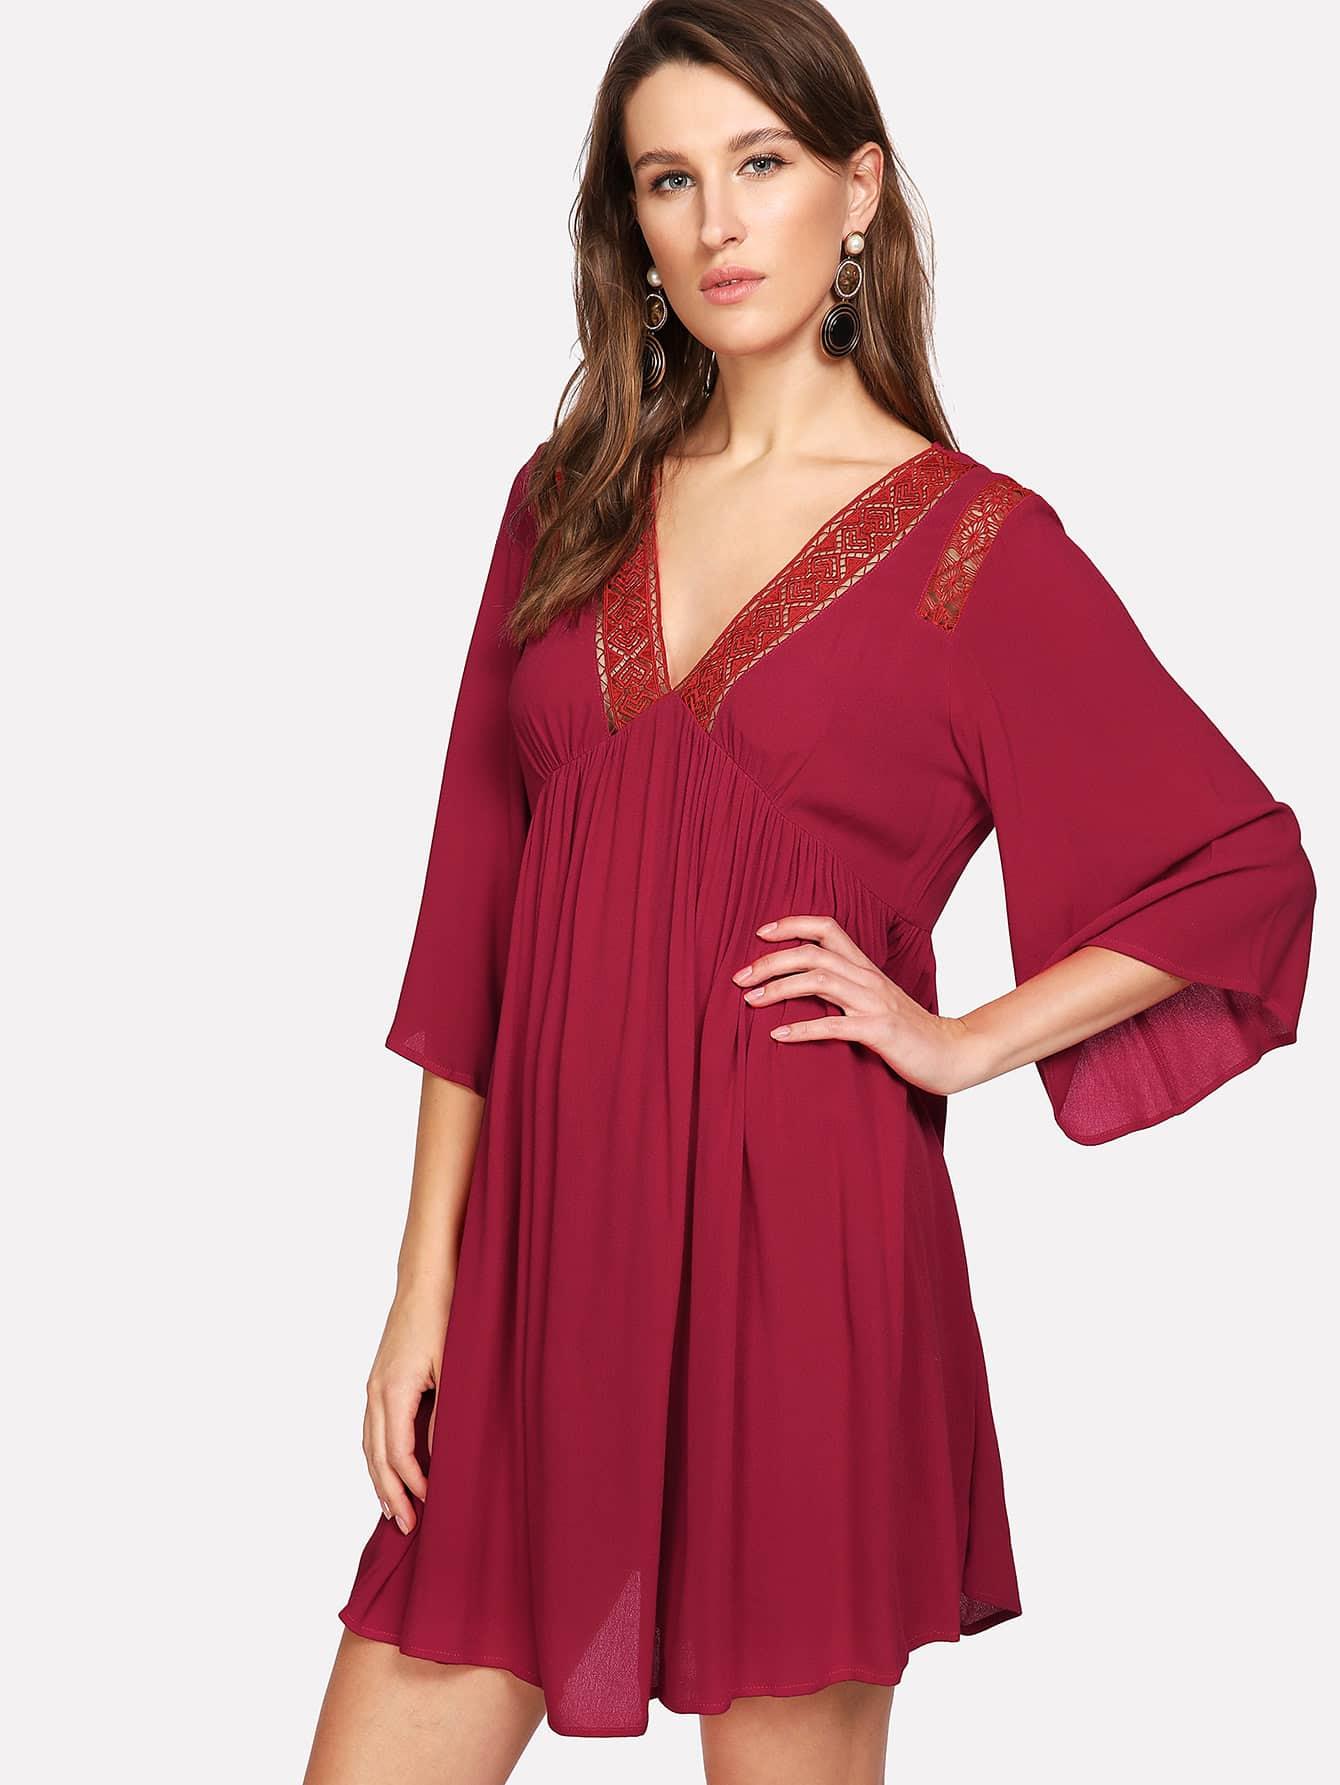 Lace Insert Empire Waist Swing Dress lace velvet swing dress